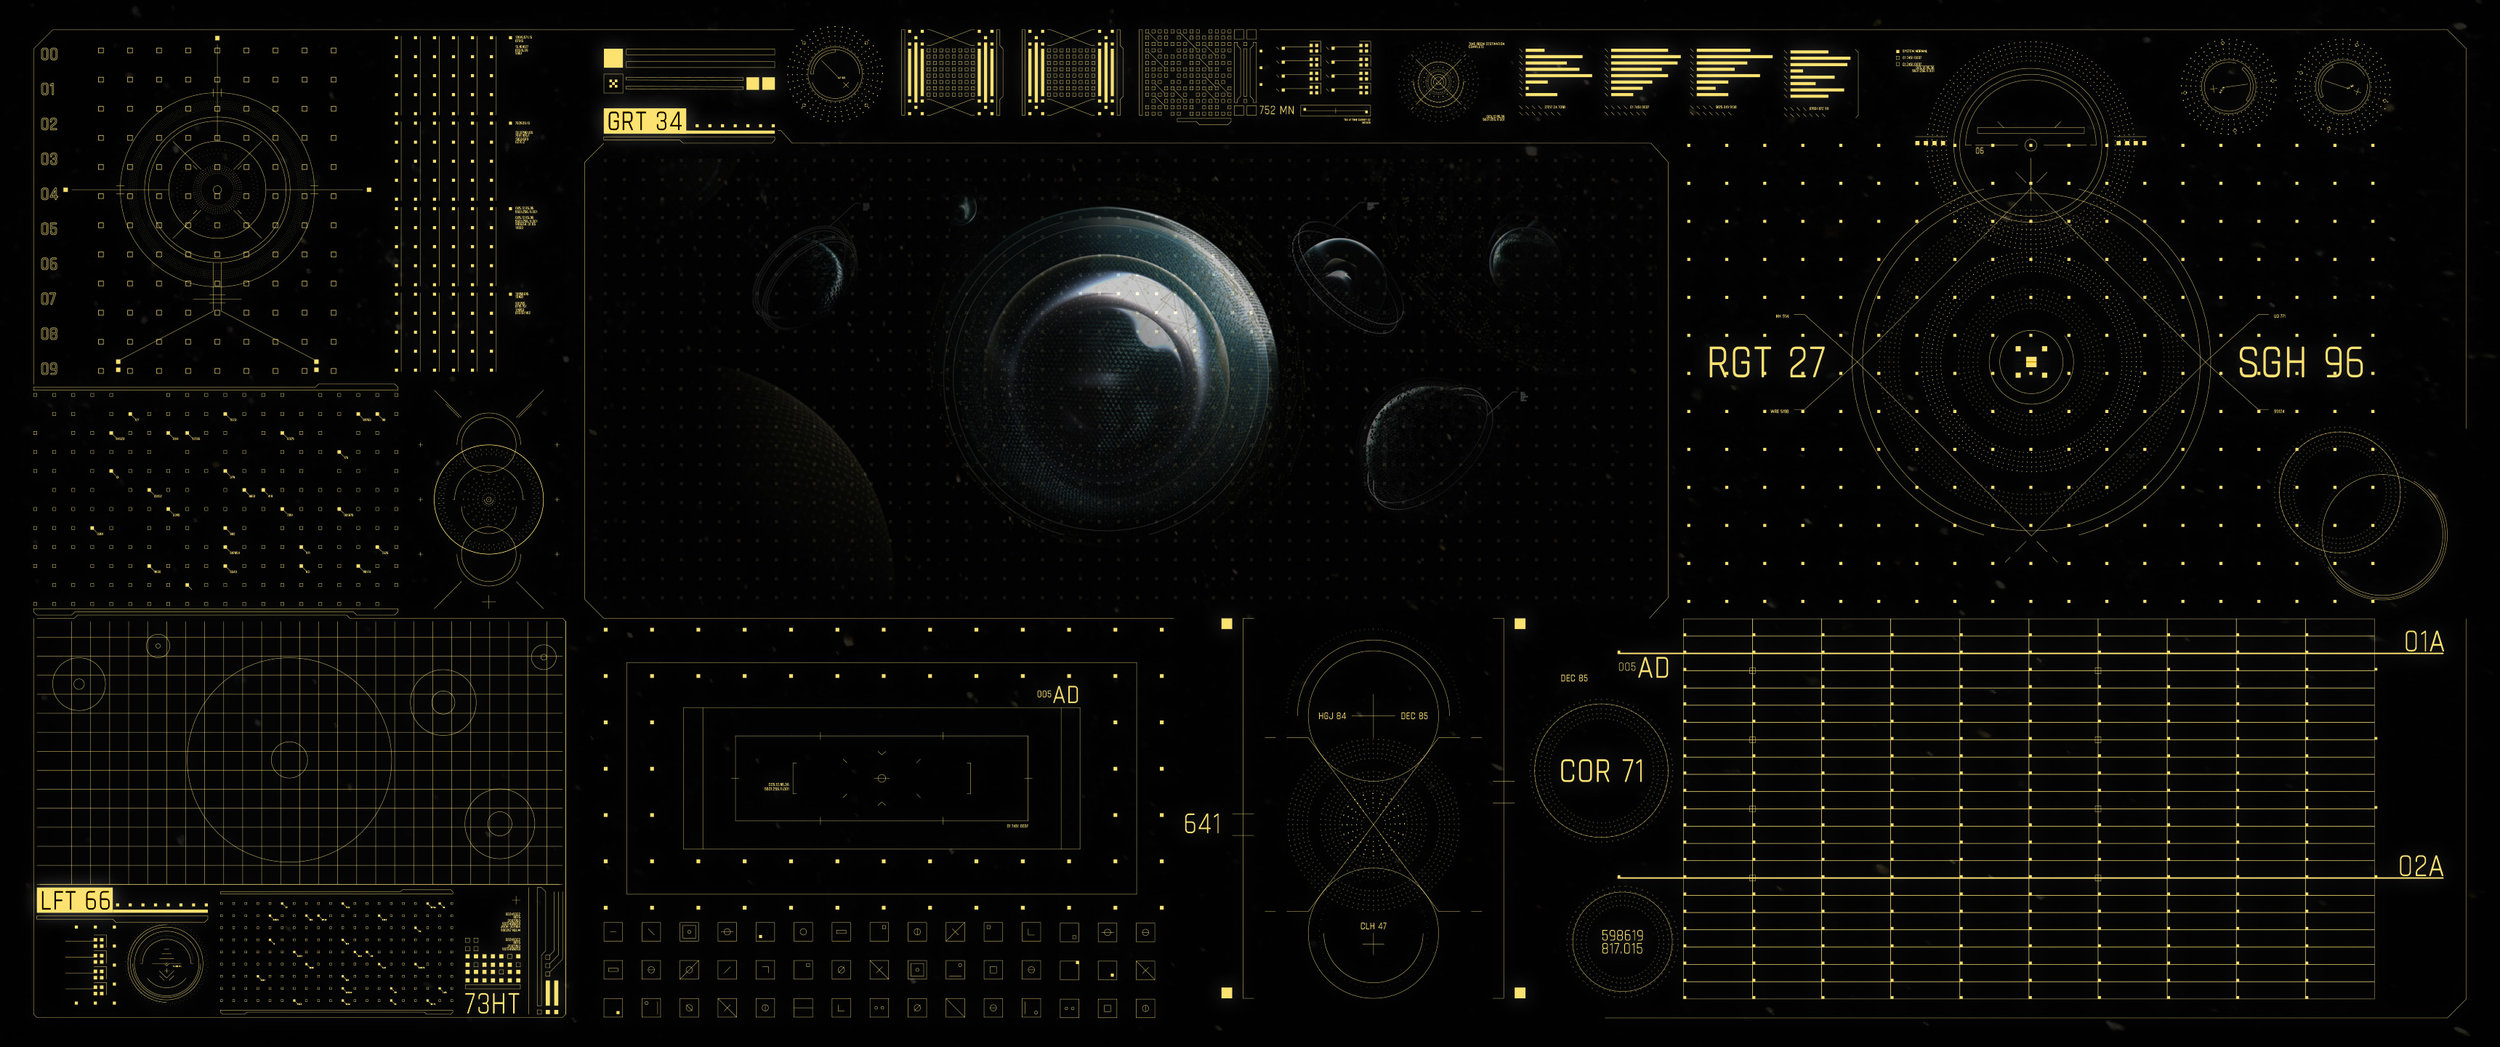 UI_01.jpg